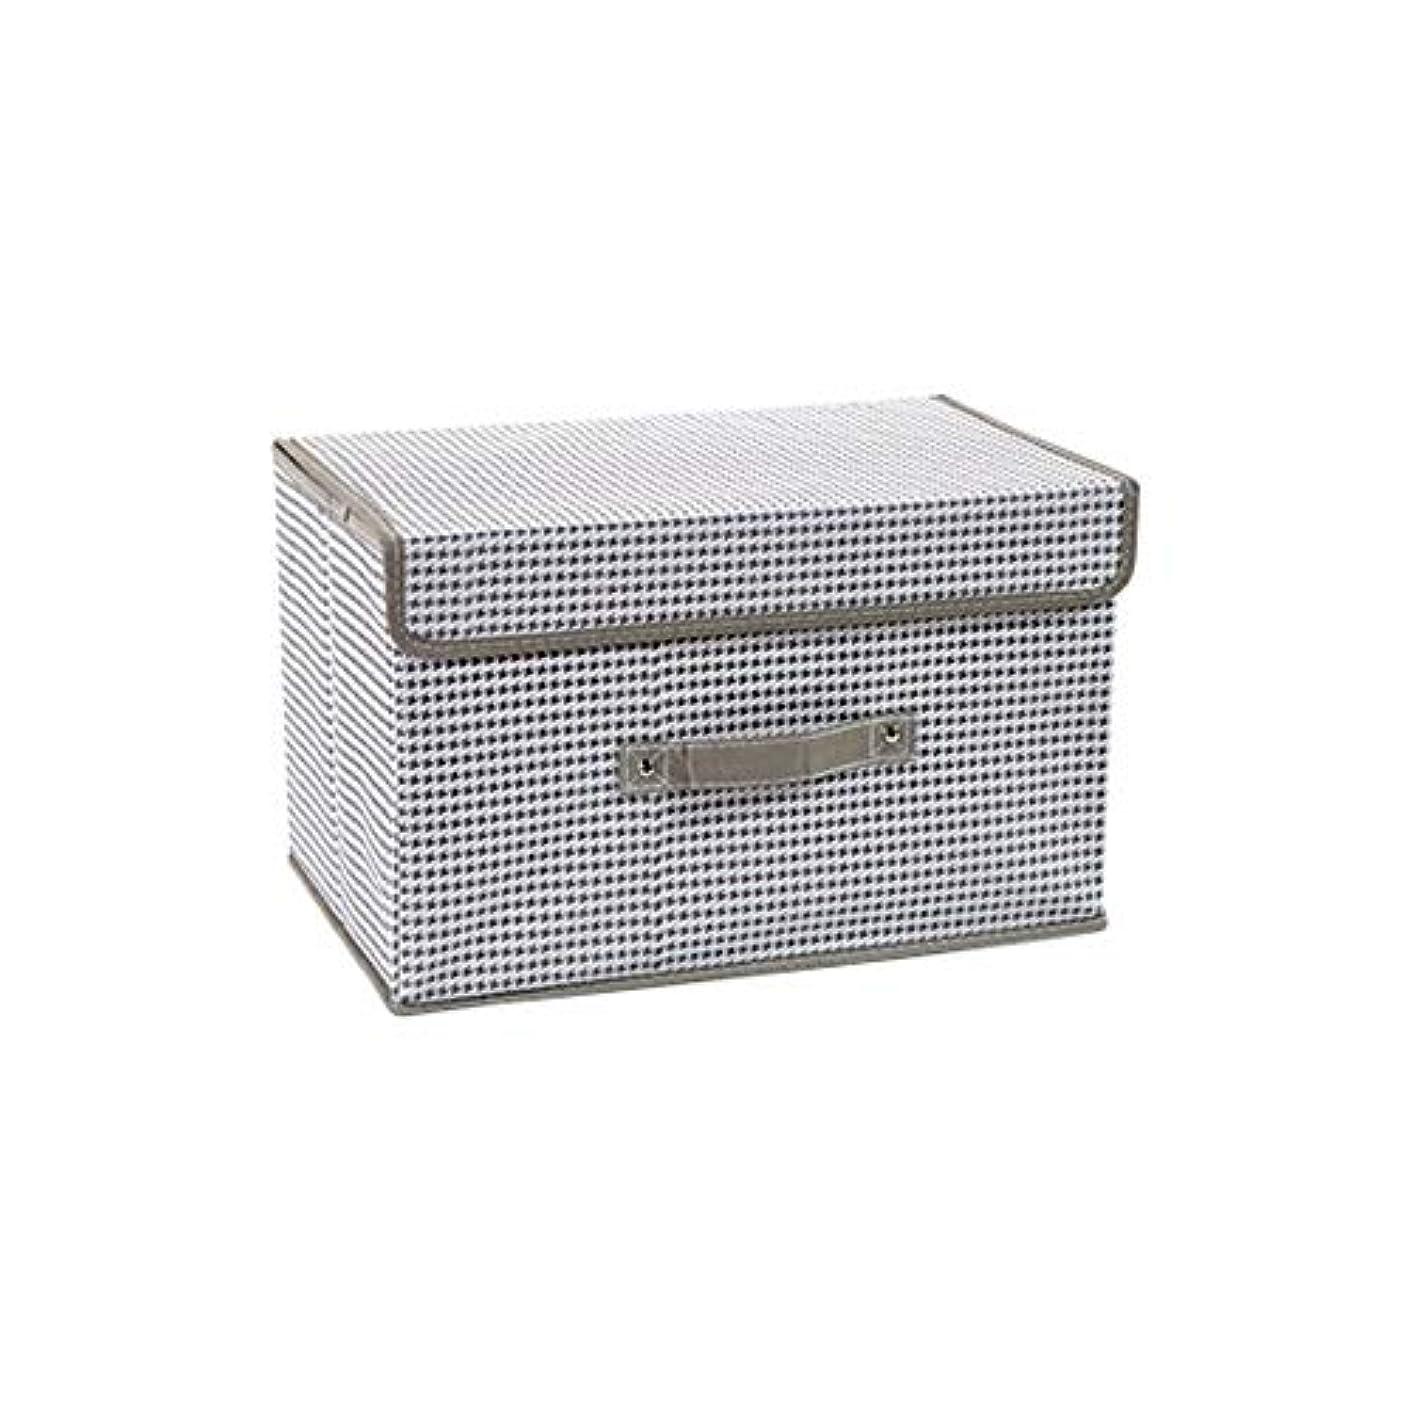 LSDAMN Storage Box Storage Organizer and Closet Storage Covered Non-Woven Storage Box Wardrobe Clothes Storage Box Toy Clothing Storage Box Fabric Folding Storage Box, Large, Lattice